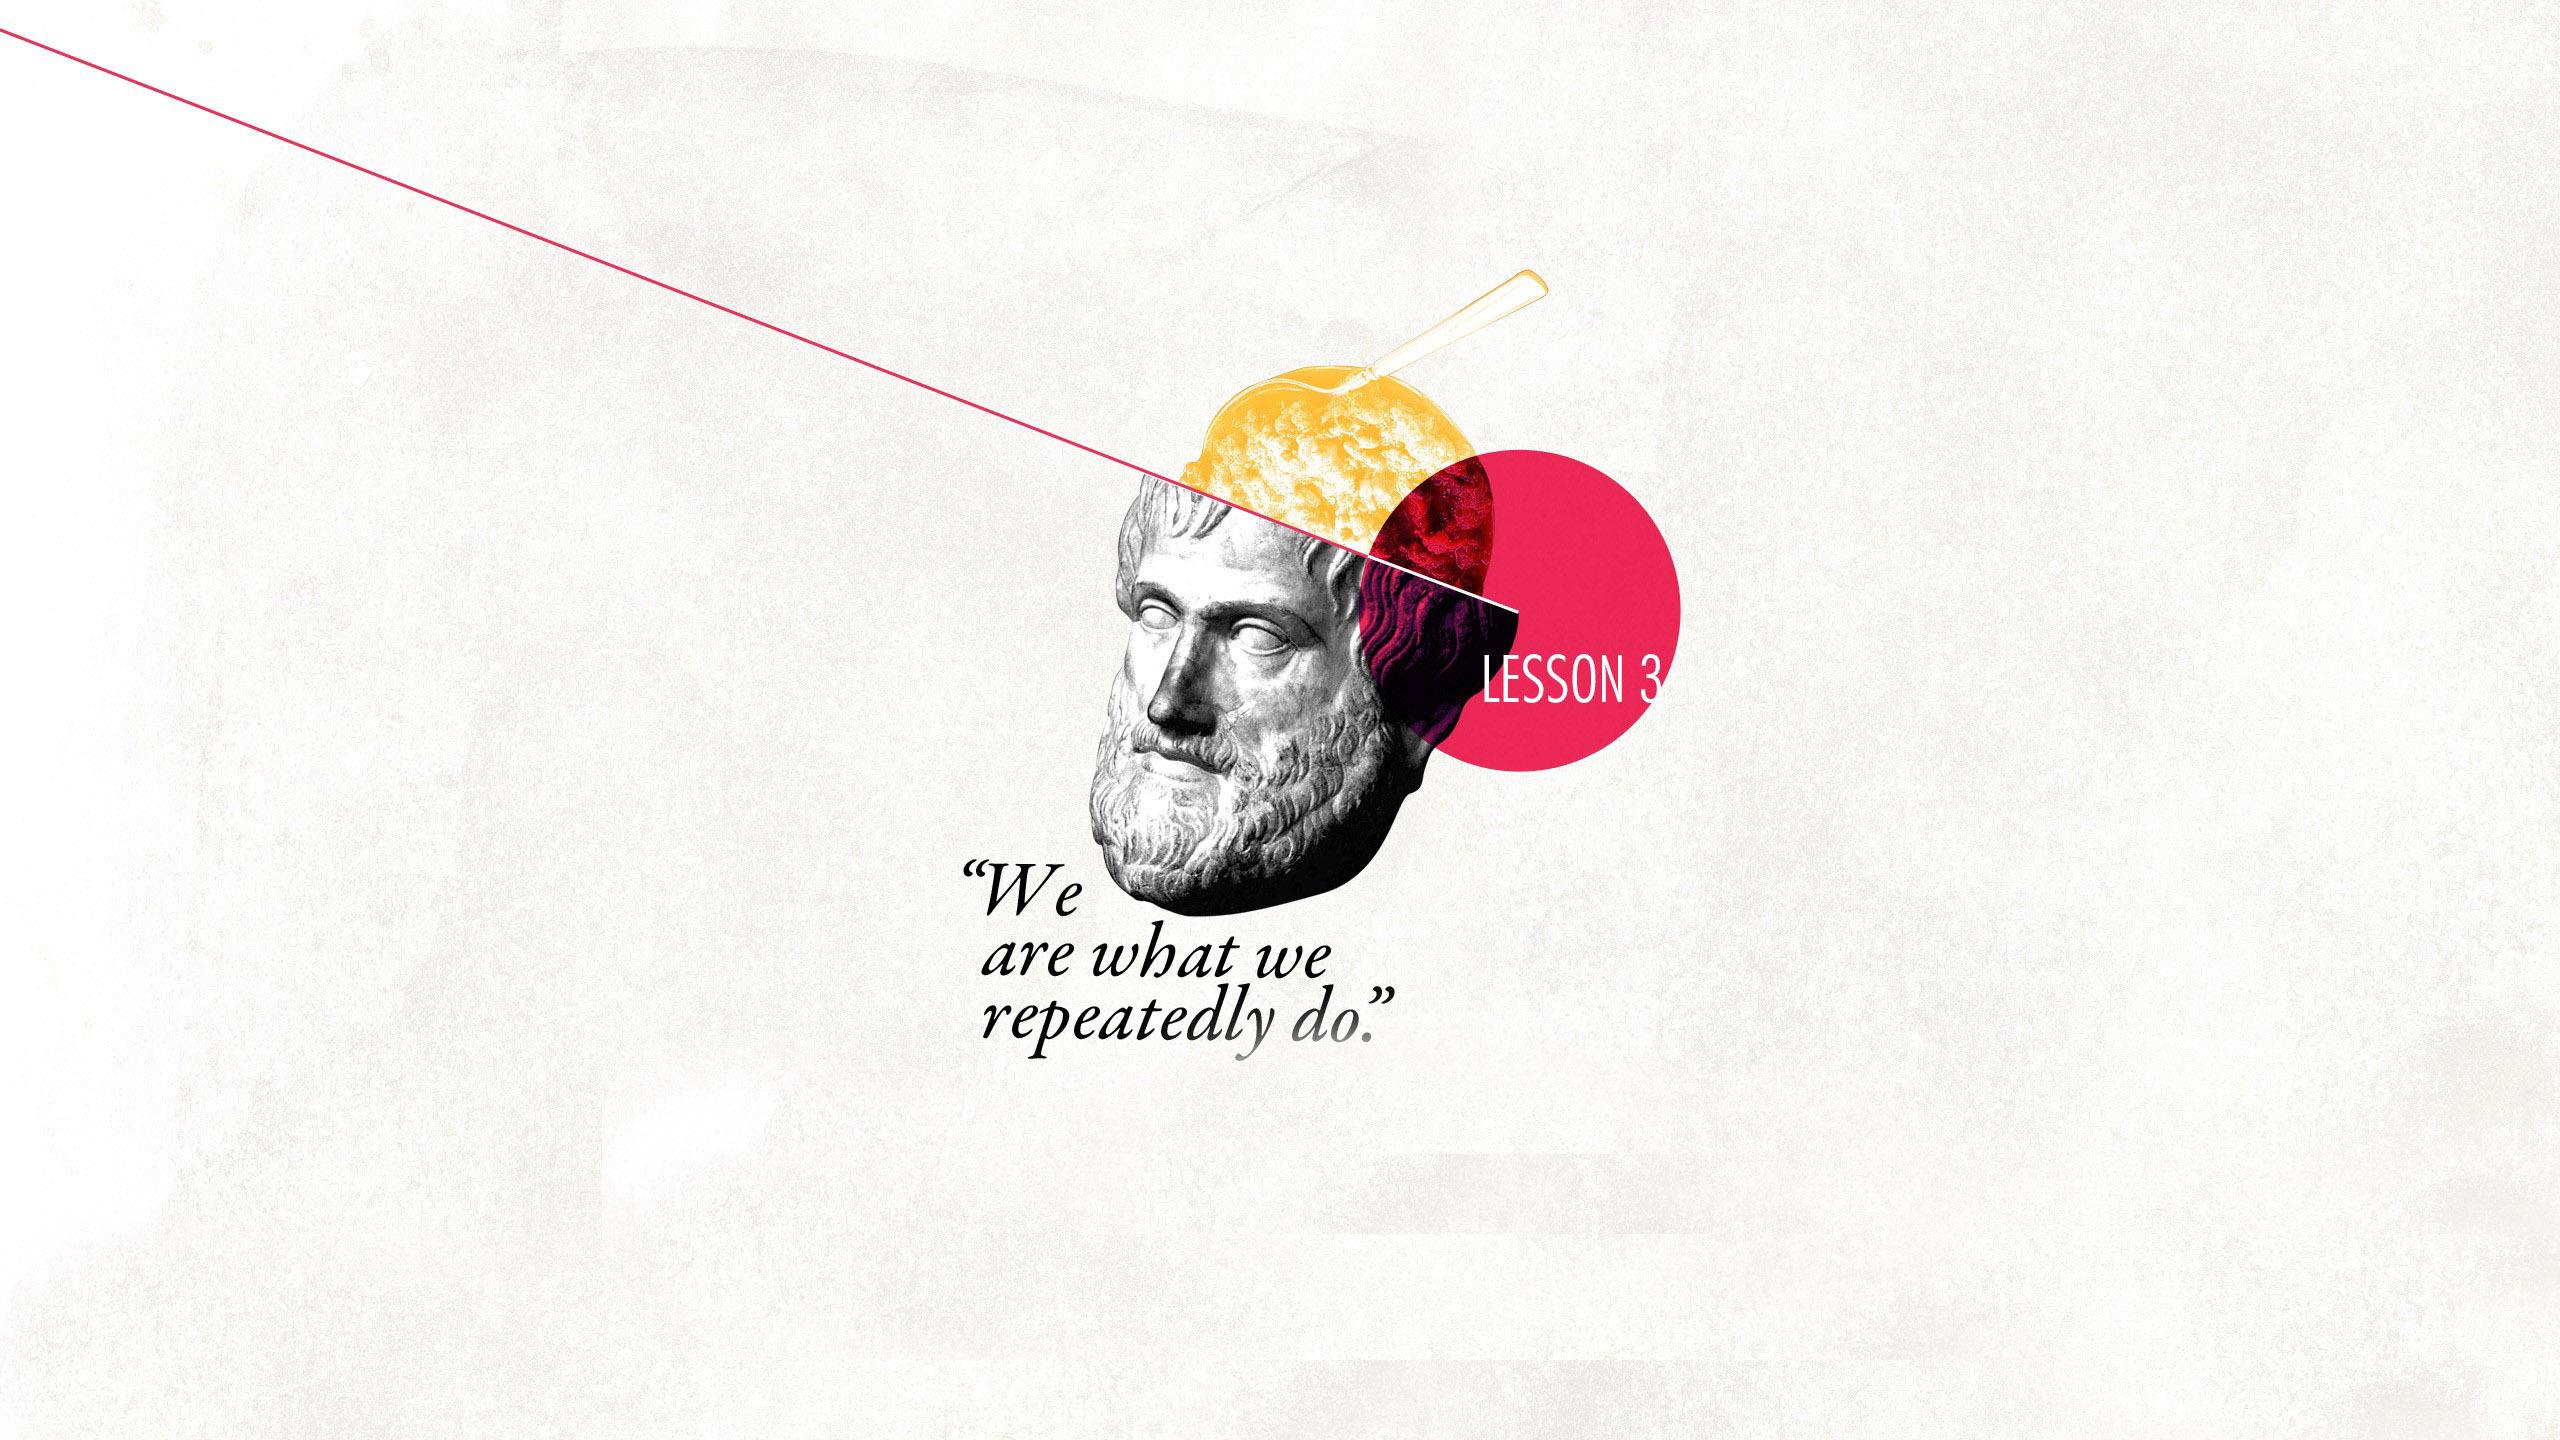 Philosophical quote Wallpaper 8144 2560x1440